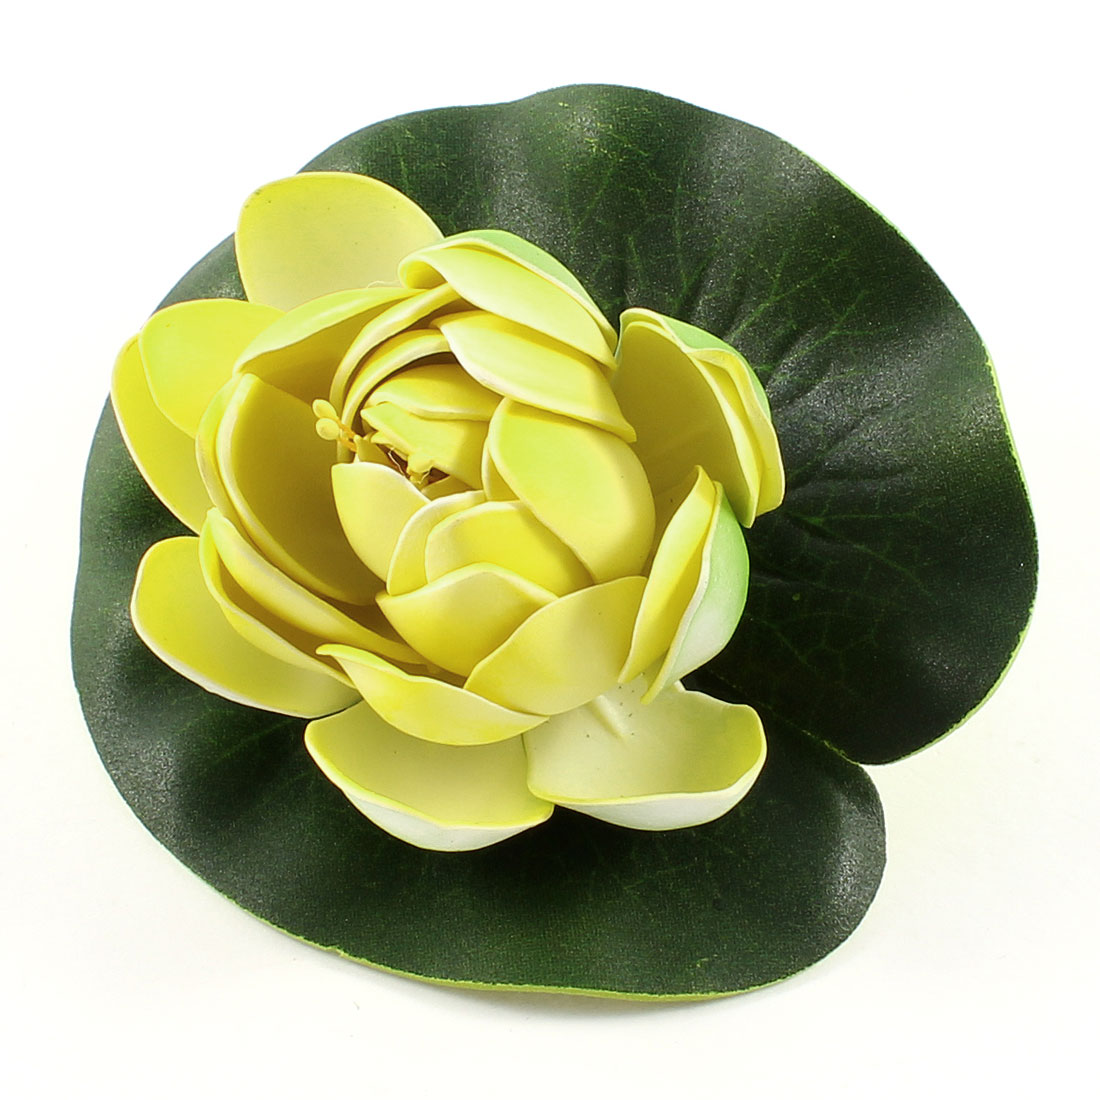 Aquarium Landscaping Decor Foam Water Plant Lotus Flower Green Yellow